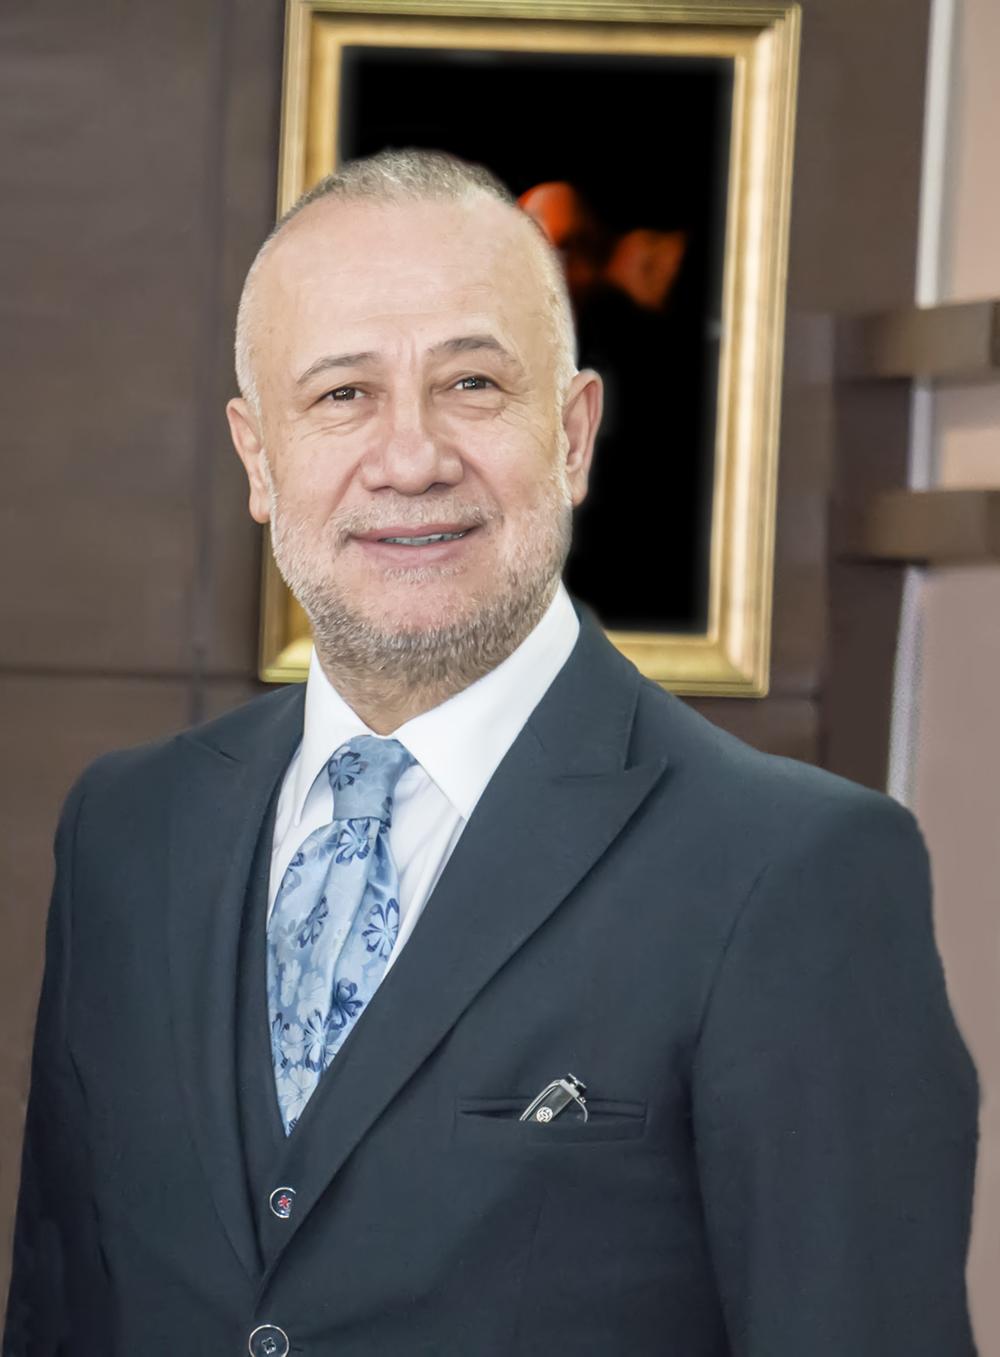 Halil Ağaoğlu